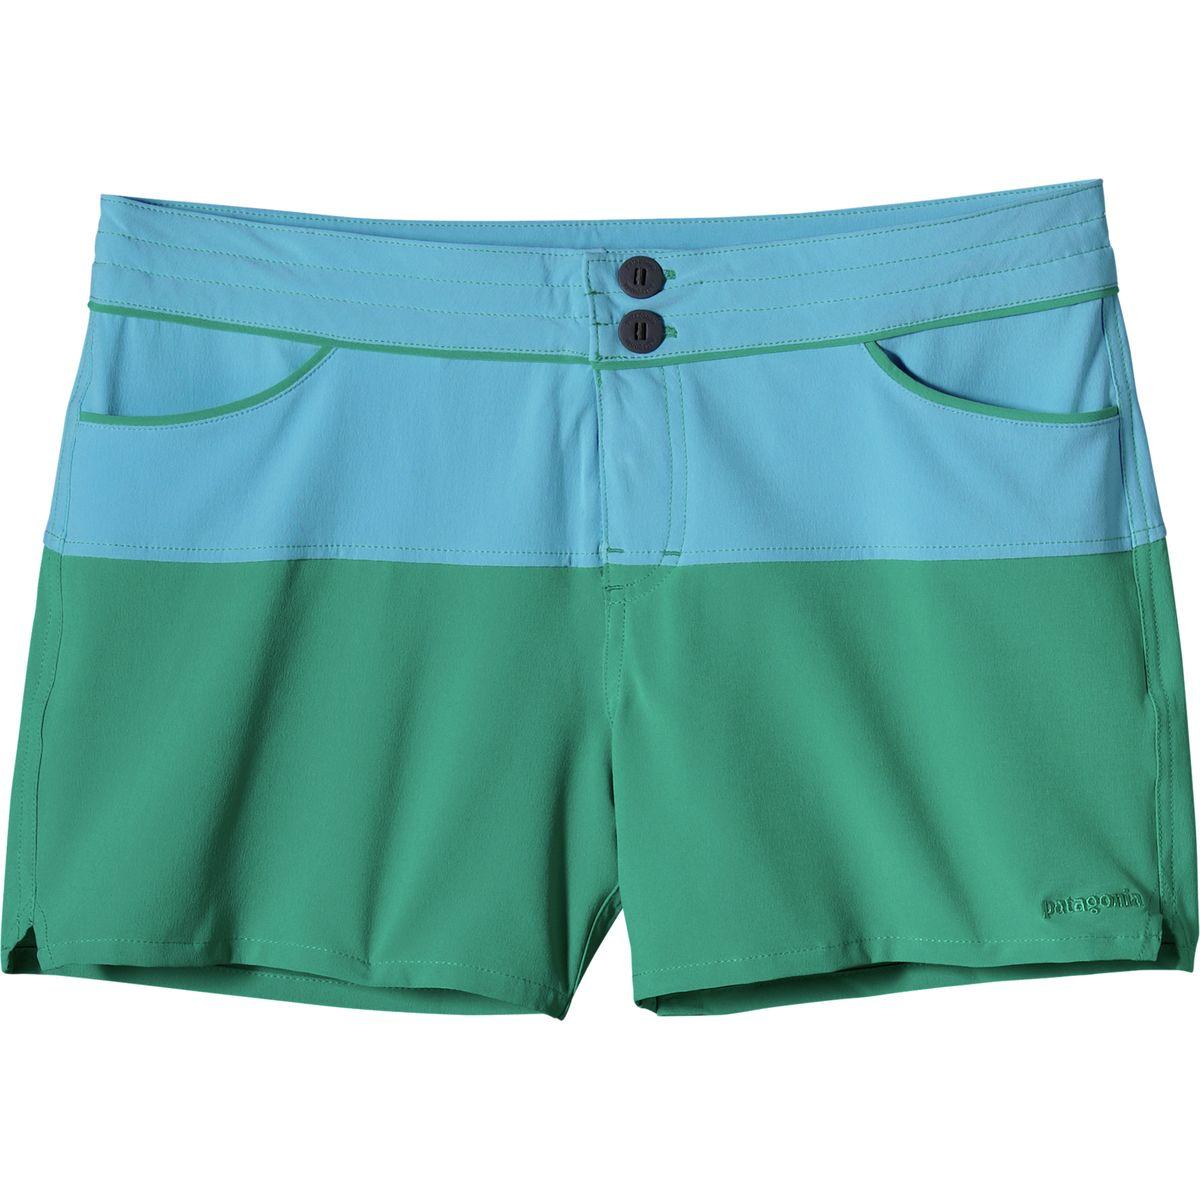 Patagonia Meridian Board Shorts